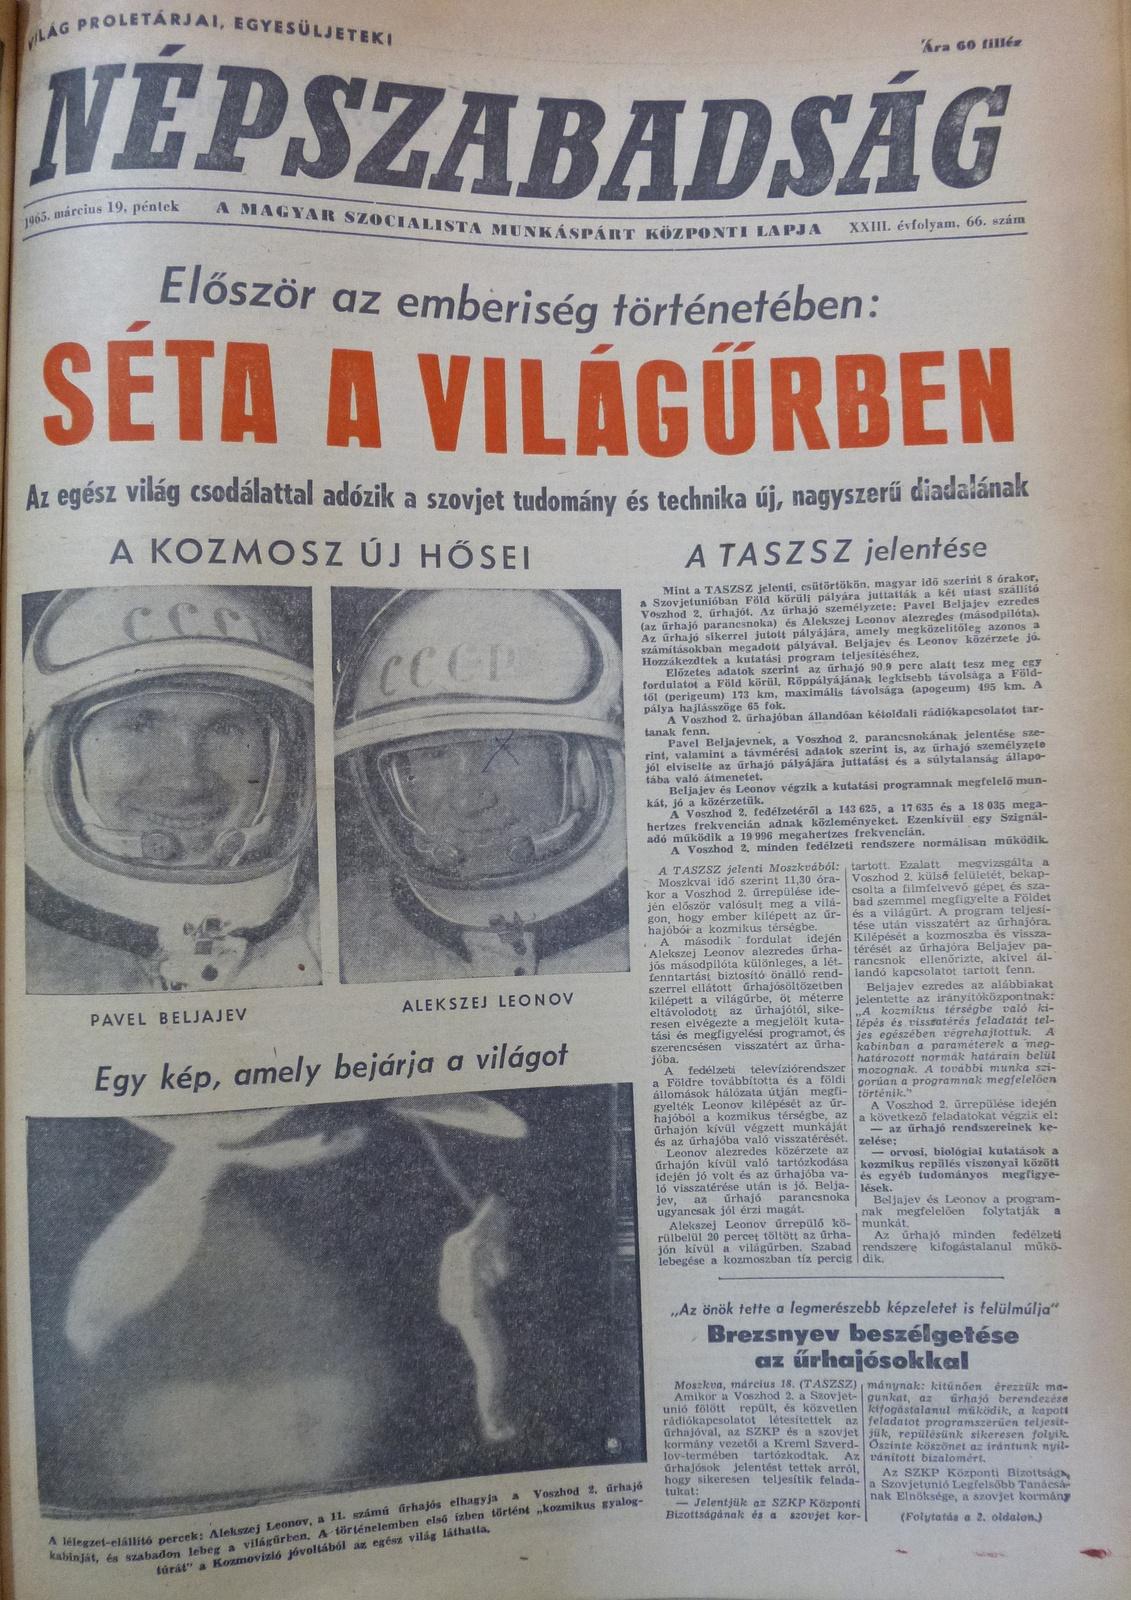 fovarosi.blog.hu: Urseta-19650319-Nepszabadsag - indafoto.hu